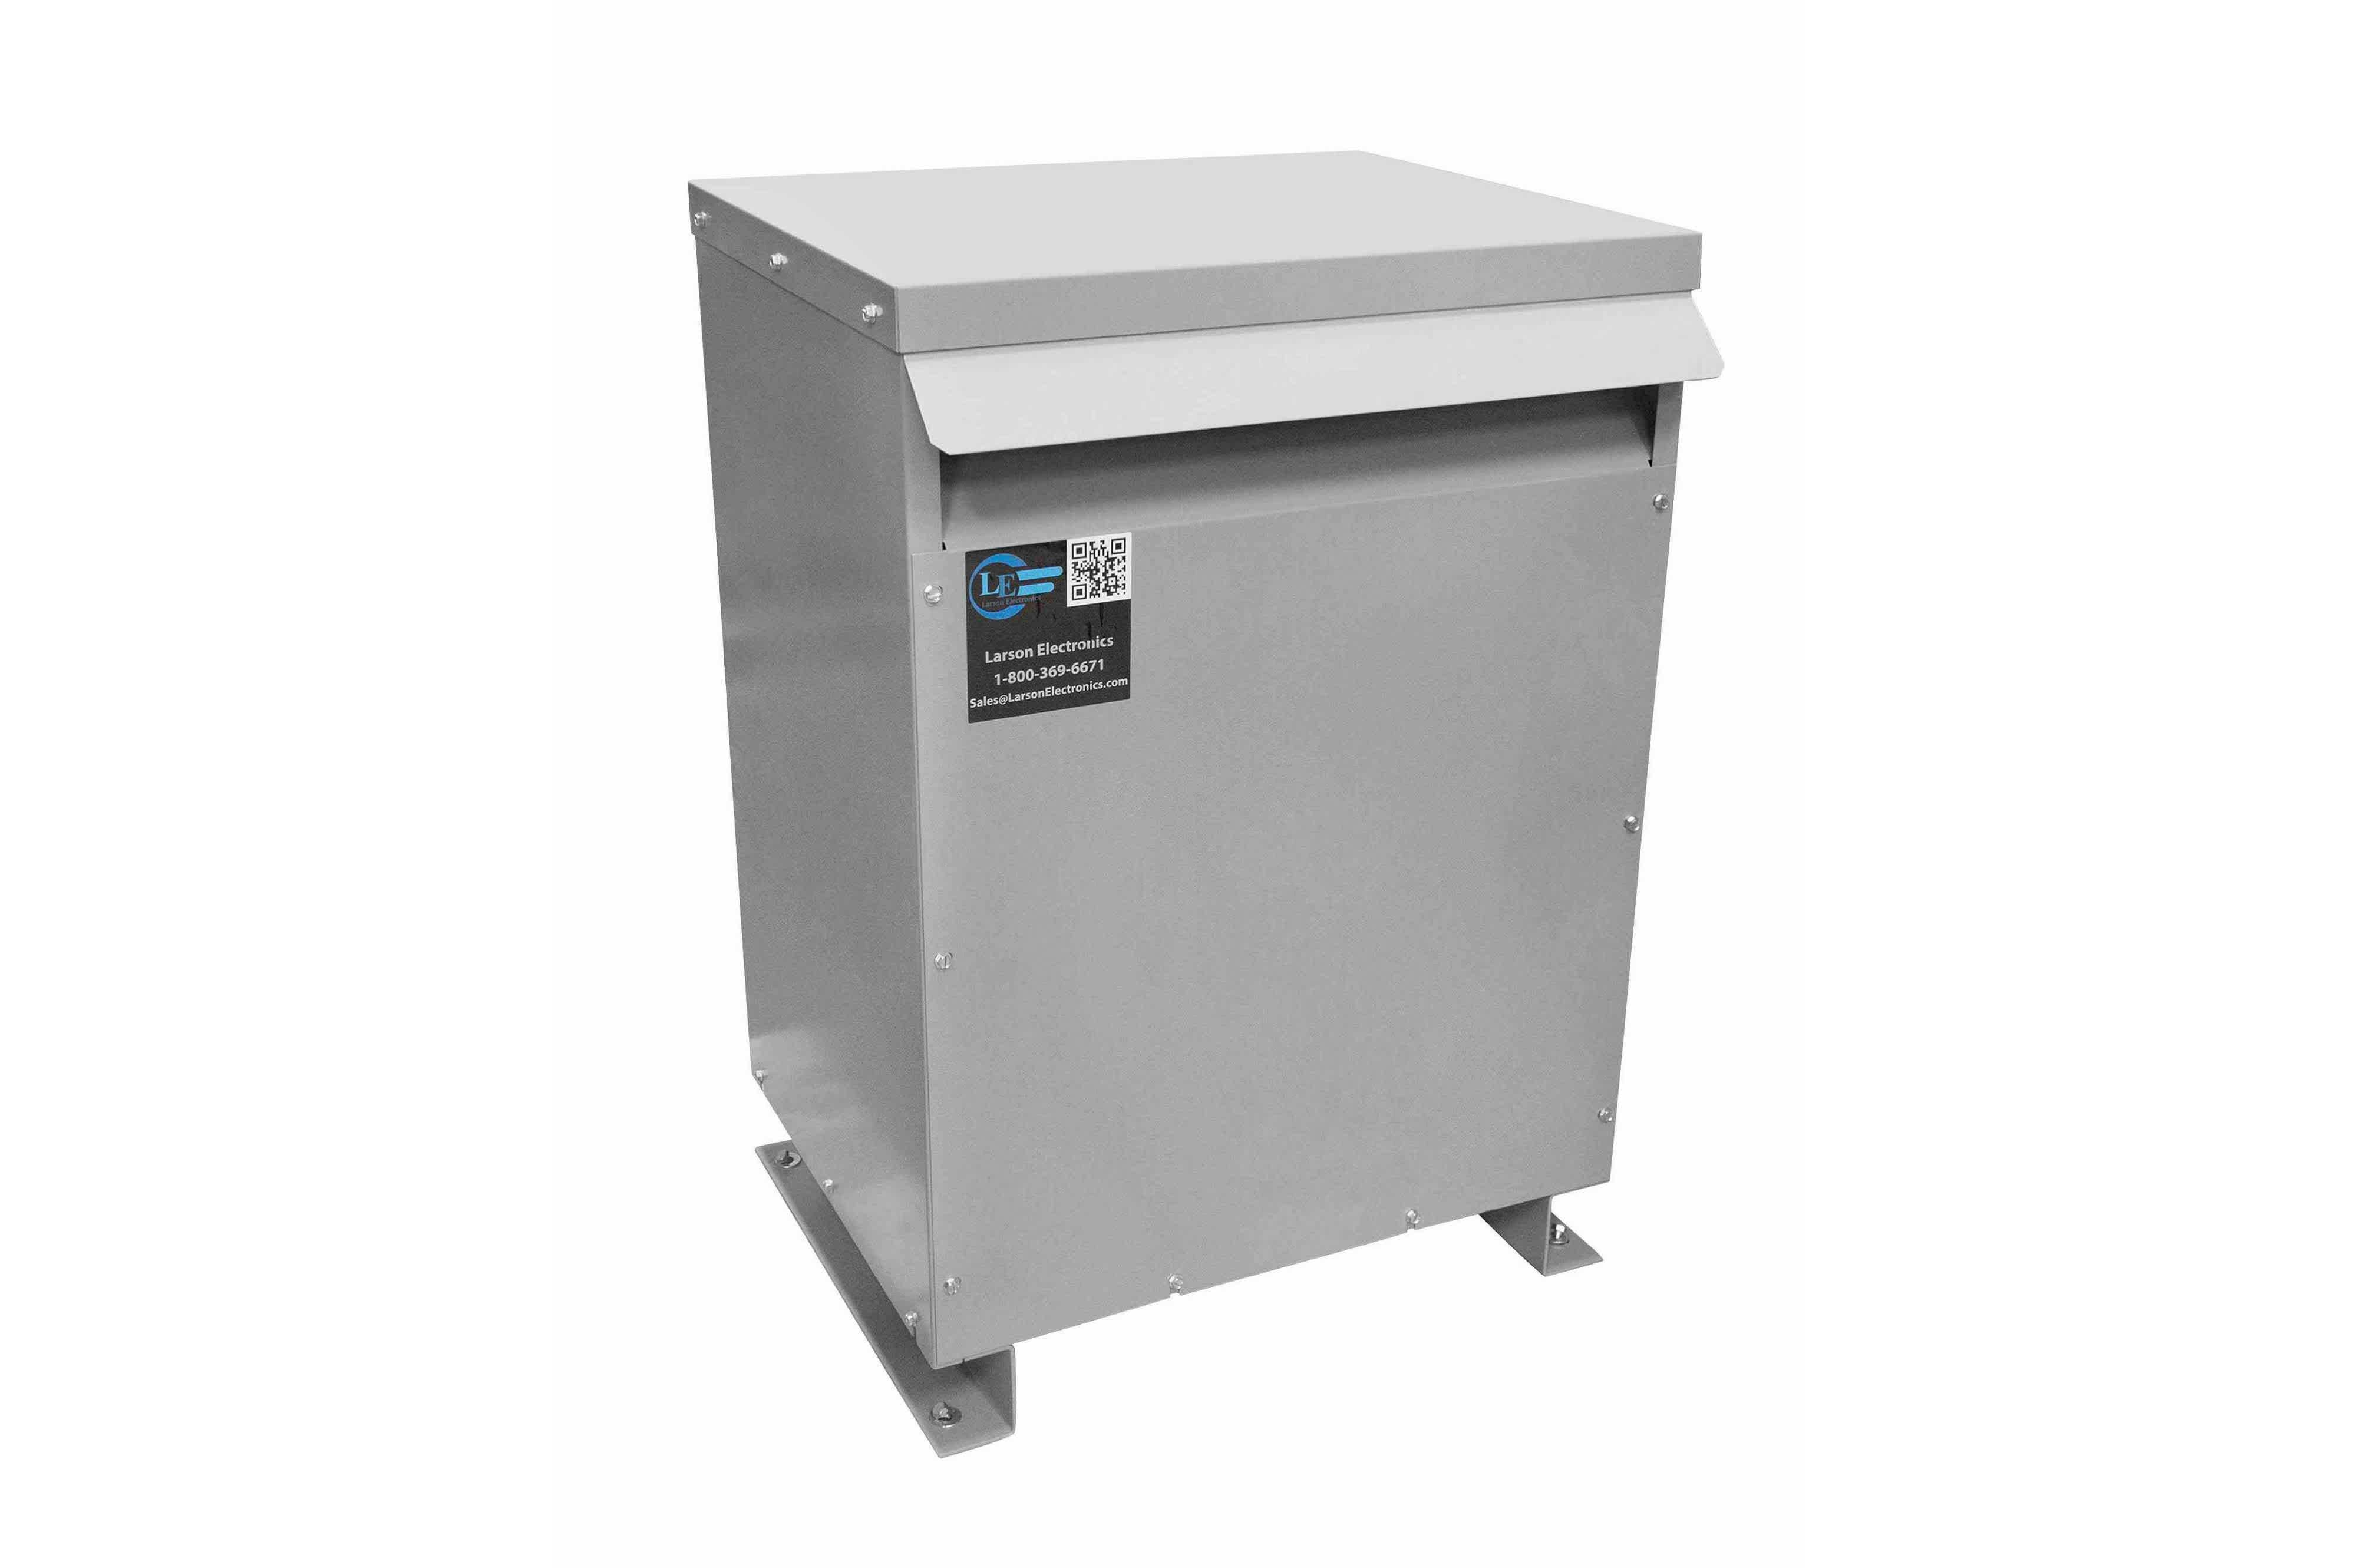 29 kVA 3PH Isolation Transformer, 460V Wye Primary, 380V Delta Secondary, N3R, Ventilated, 60 Hz